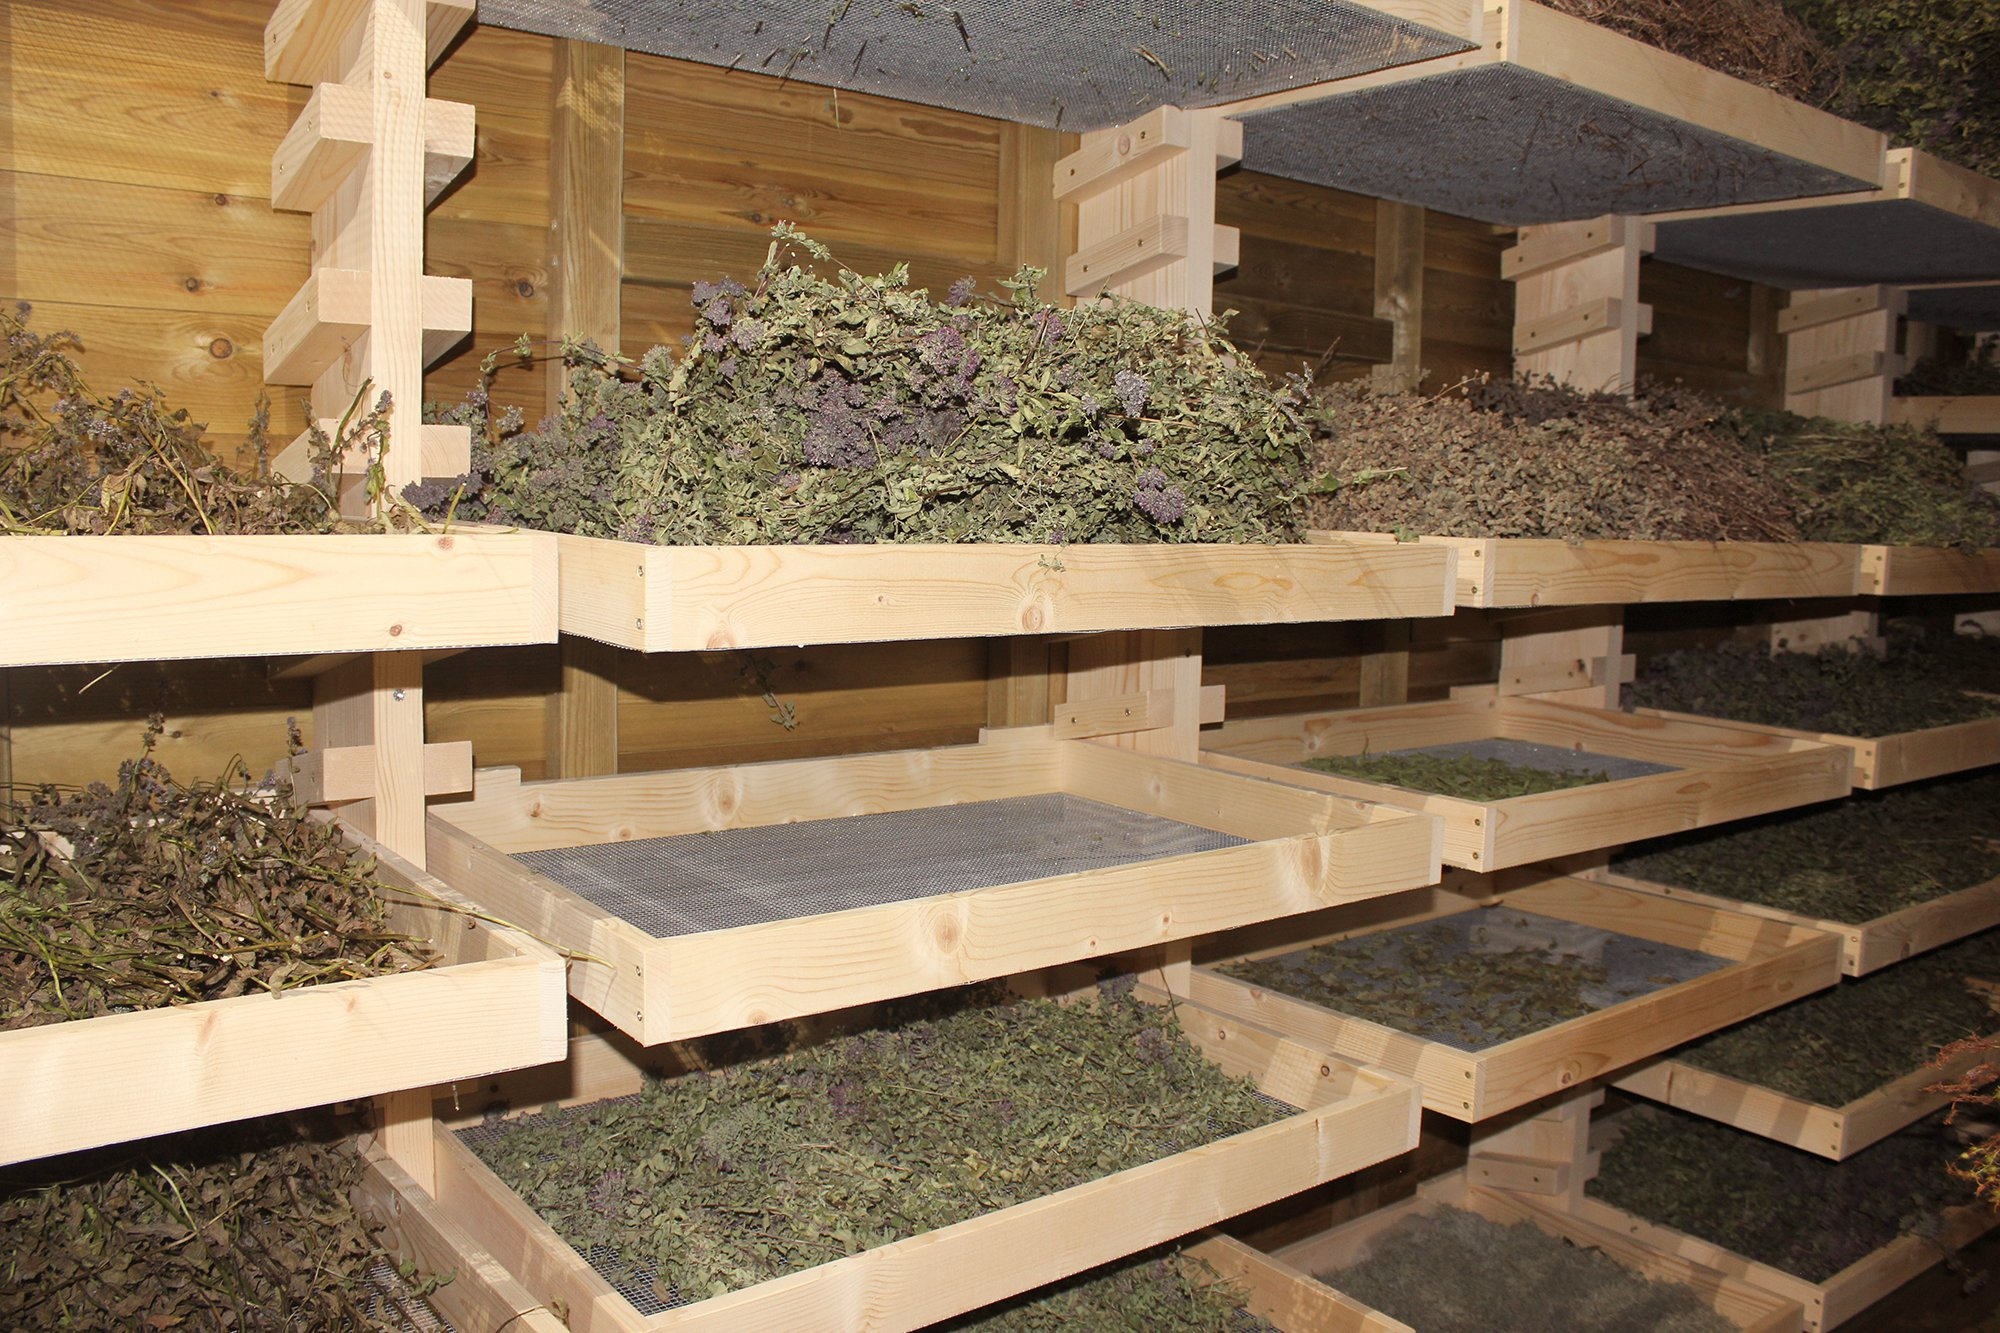 como secar hierbas aromaticas